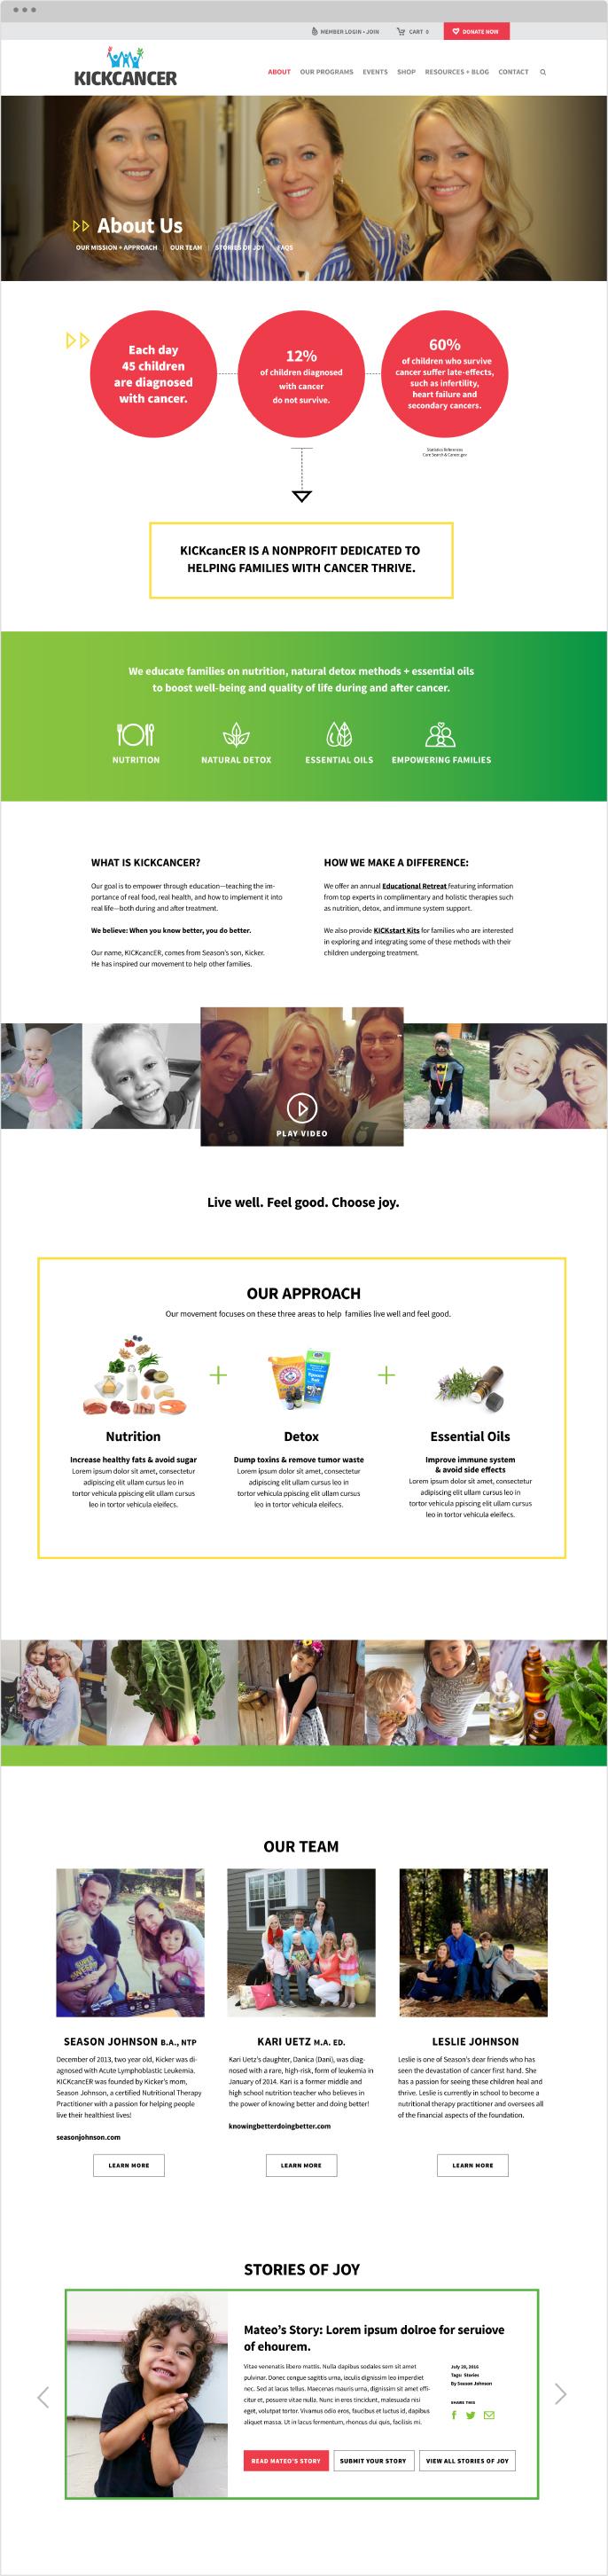 Kickcancer webite